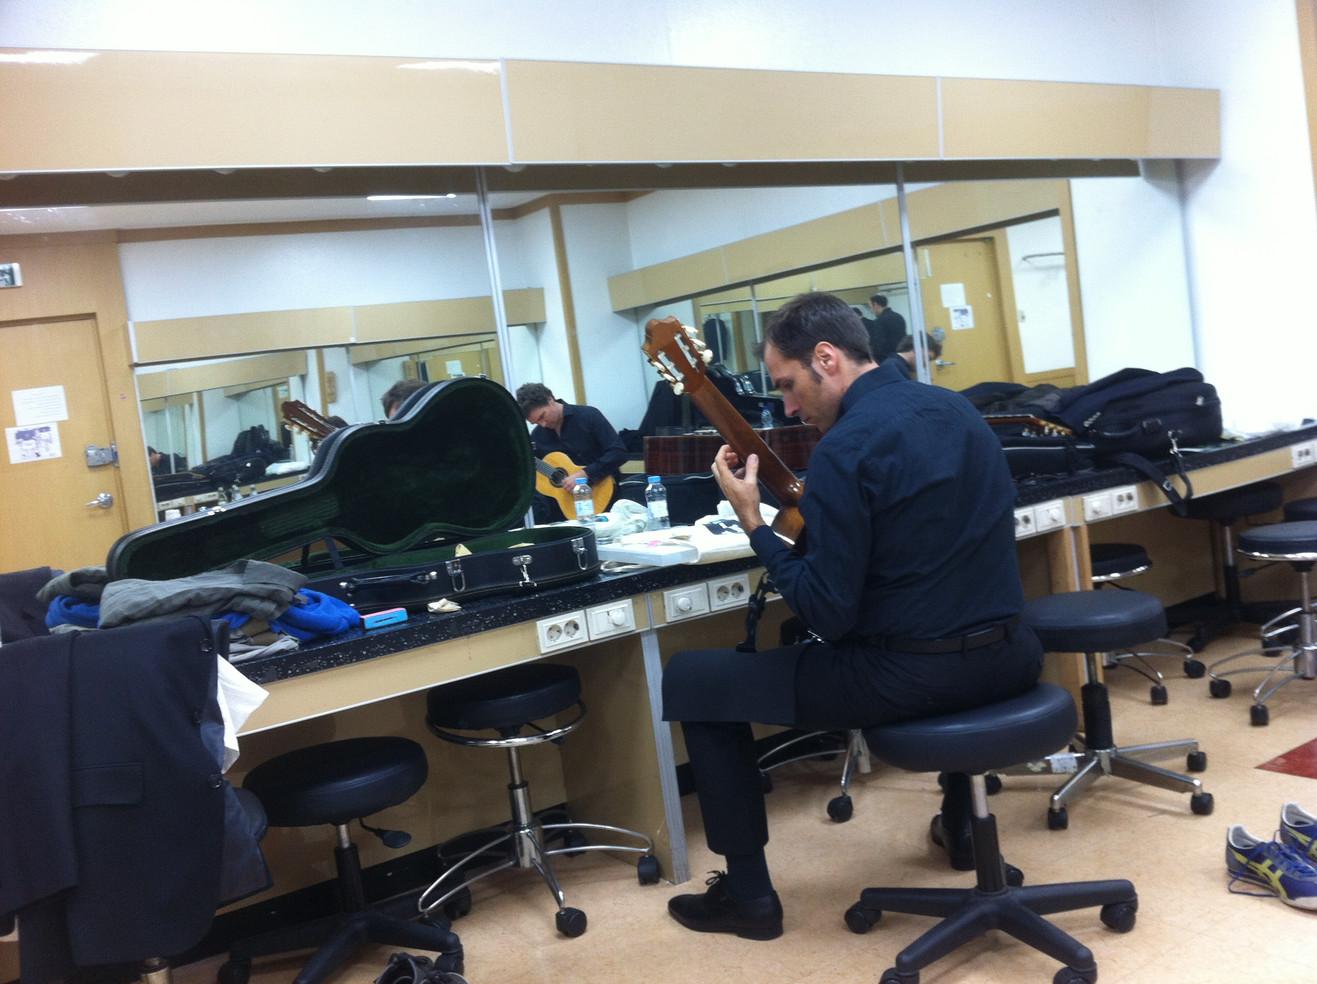 Ulju Arts Center Korea Backstage Christian Wernicke